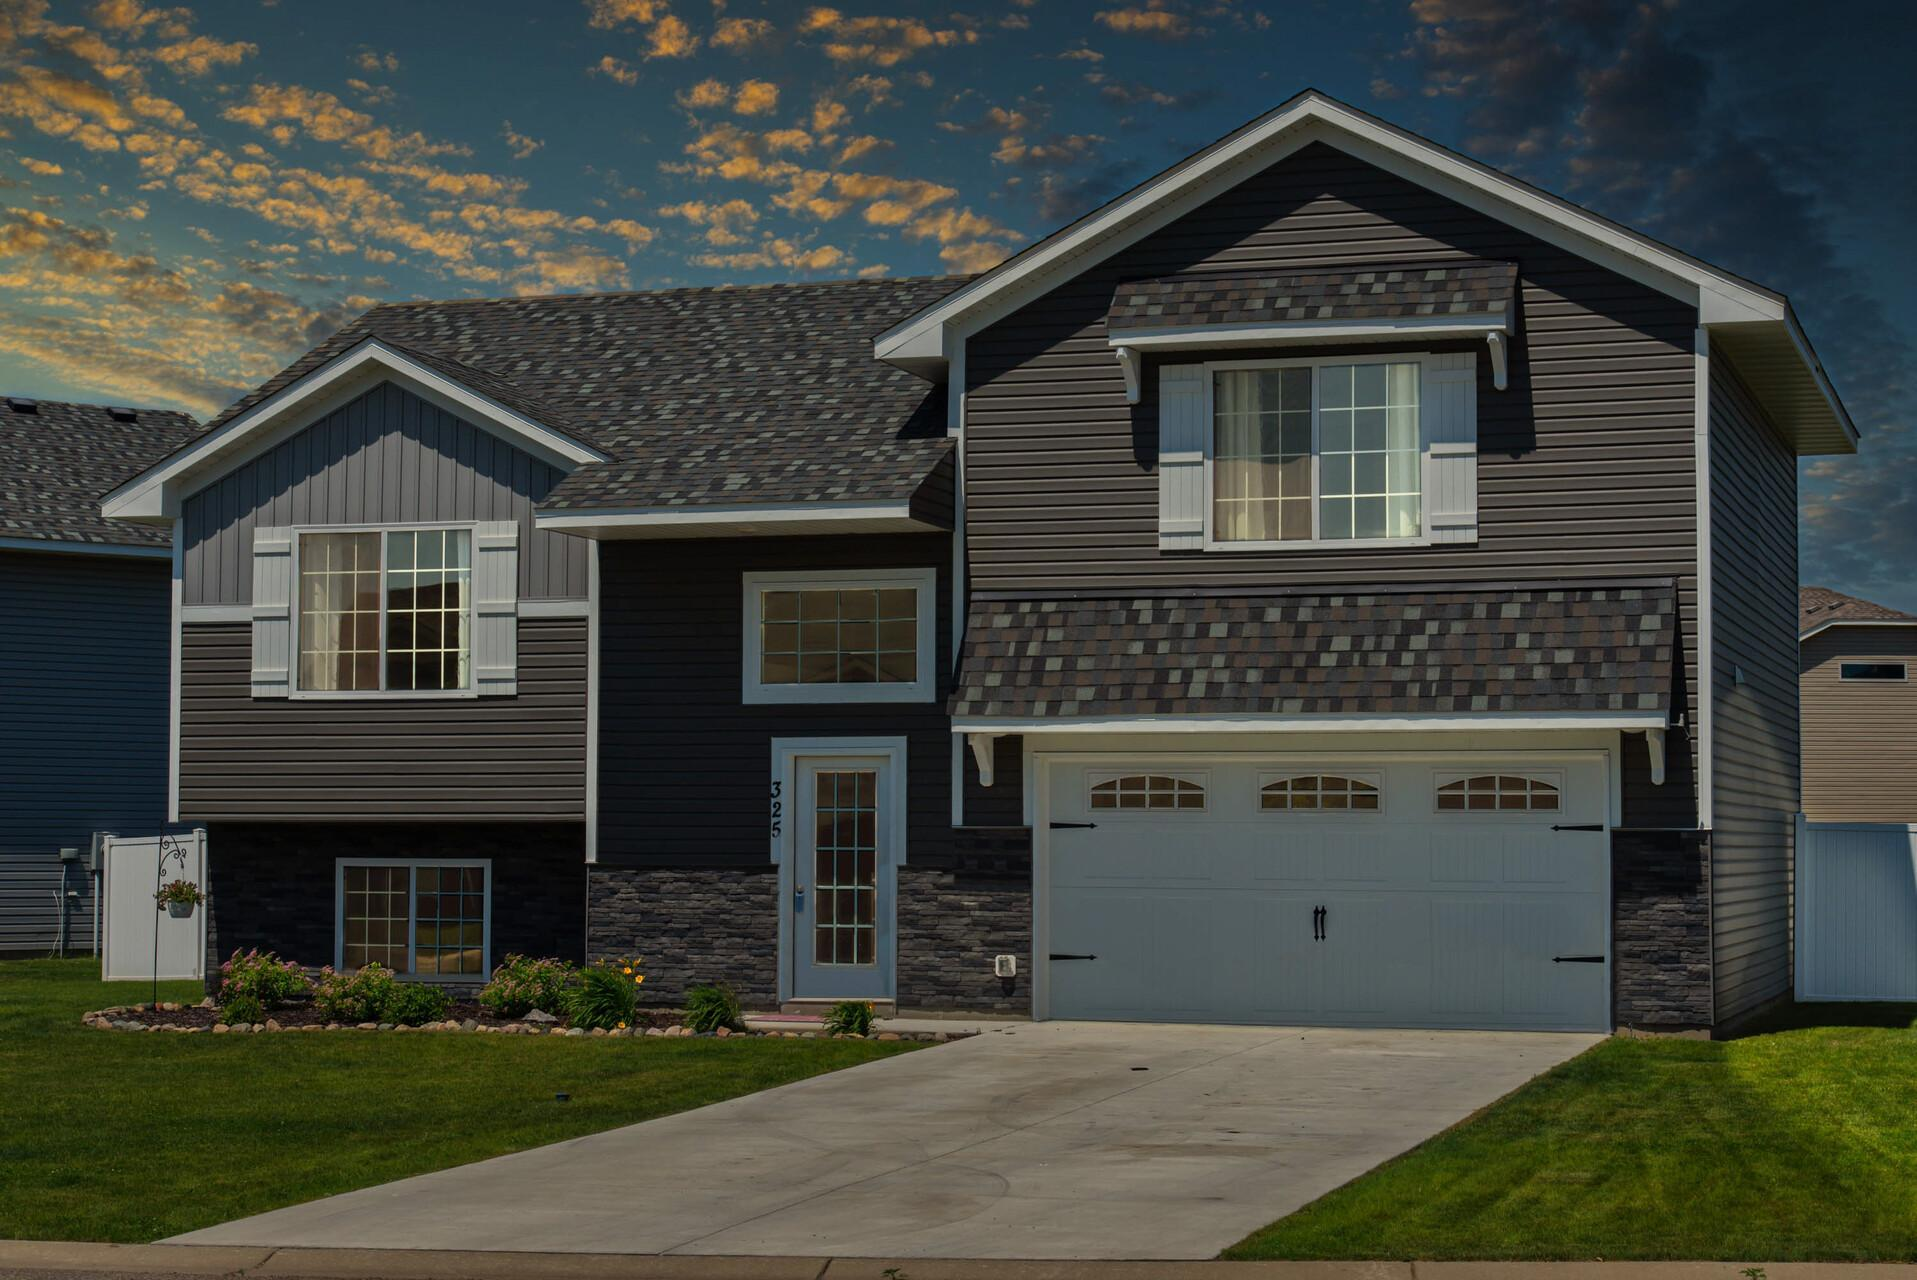 325 Terning Property Photo - Howard Lake, MN real estate listing